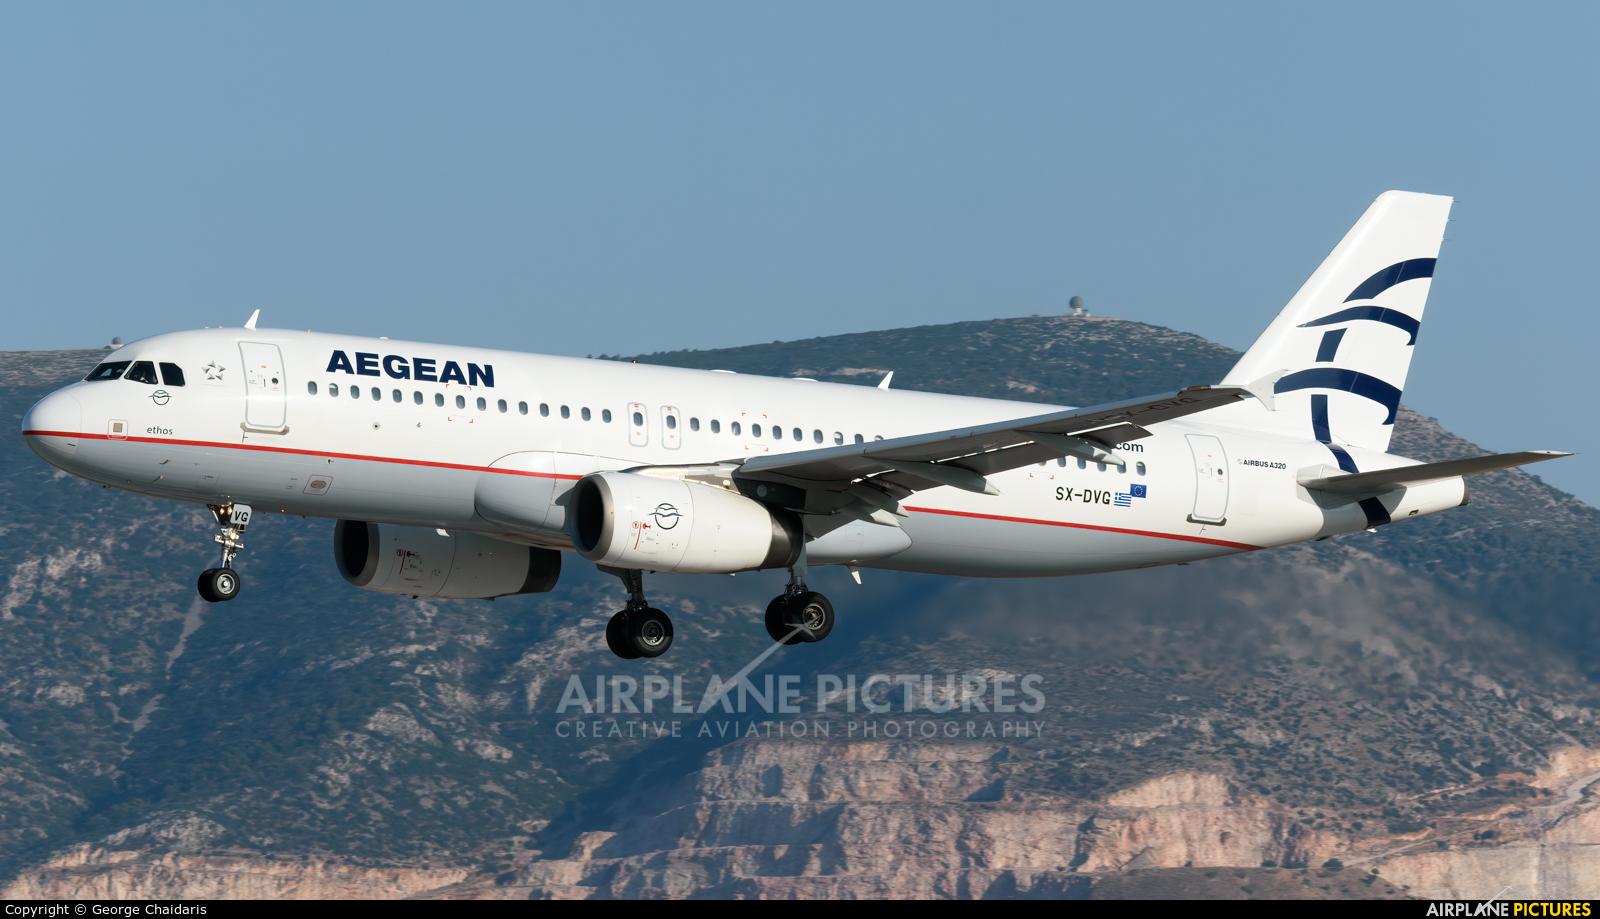 Aegean Airlines SX-DVG aircraft at Athens - Eleftherios Venizelos